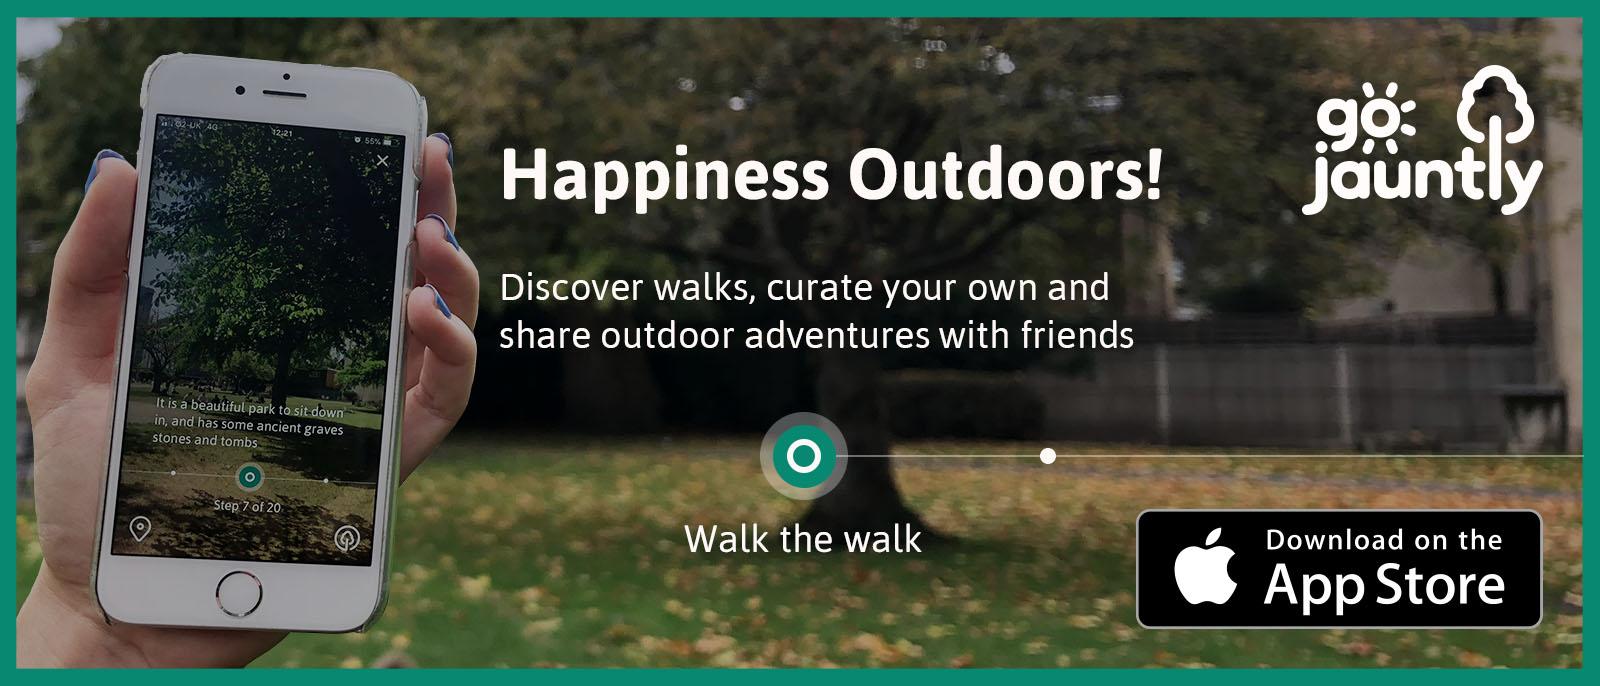 Walk_app-GoJauntly-v03.jpg